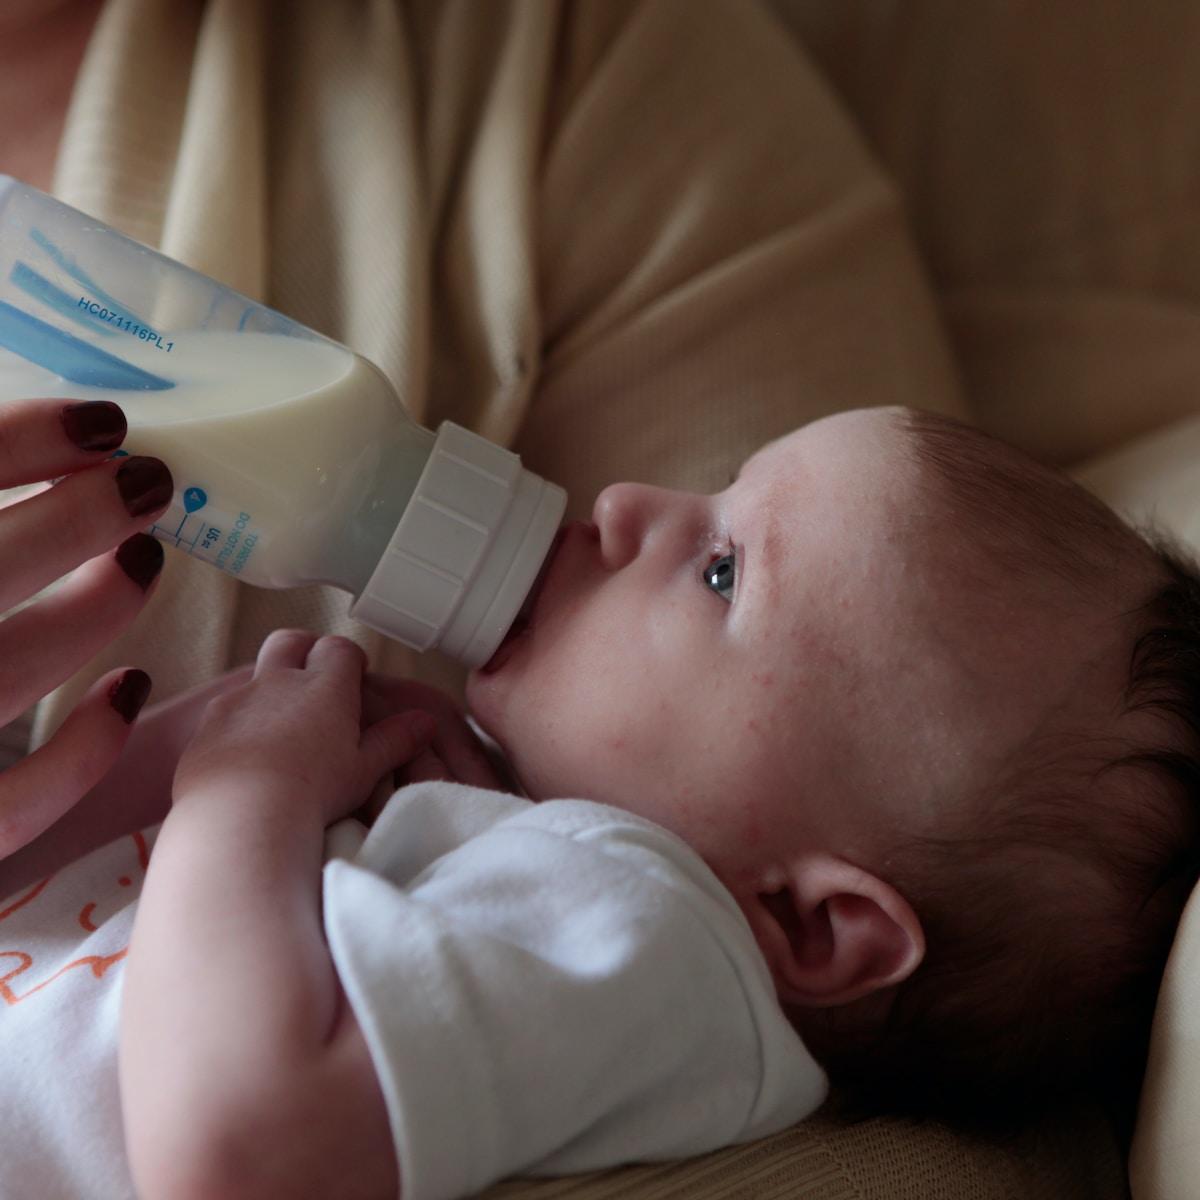 leche materna artificial, Baby feeding from a bottle